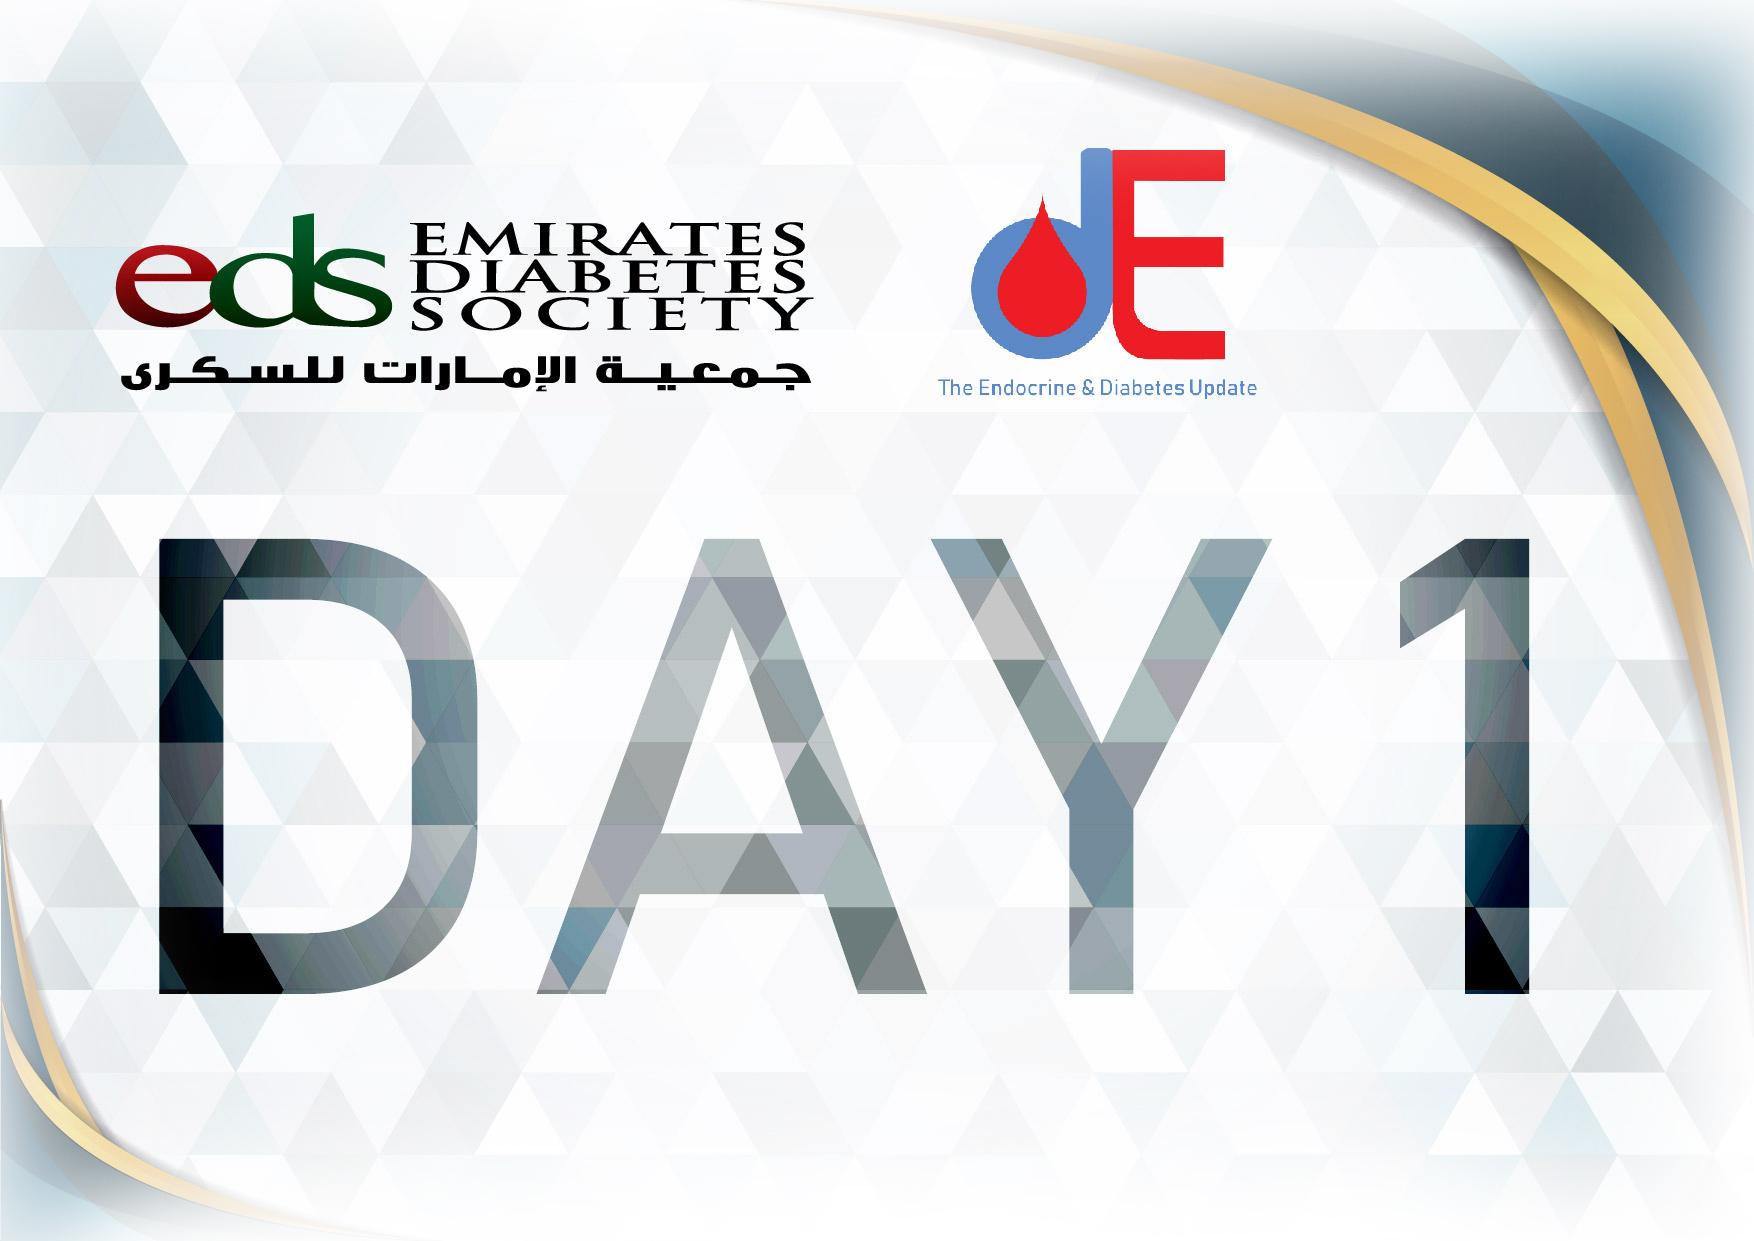 Saturday, 31 August 2019 - Radisson Blu SharjahRegistration Starts at 08:00 AM